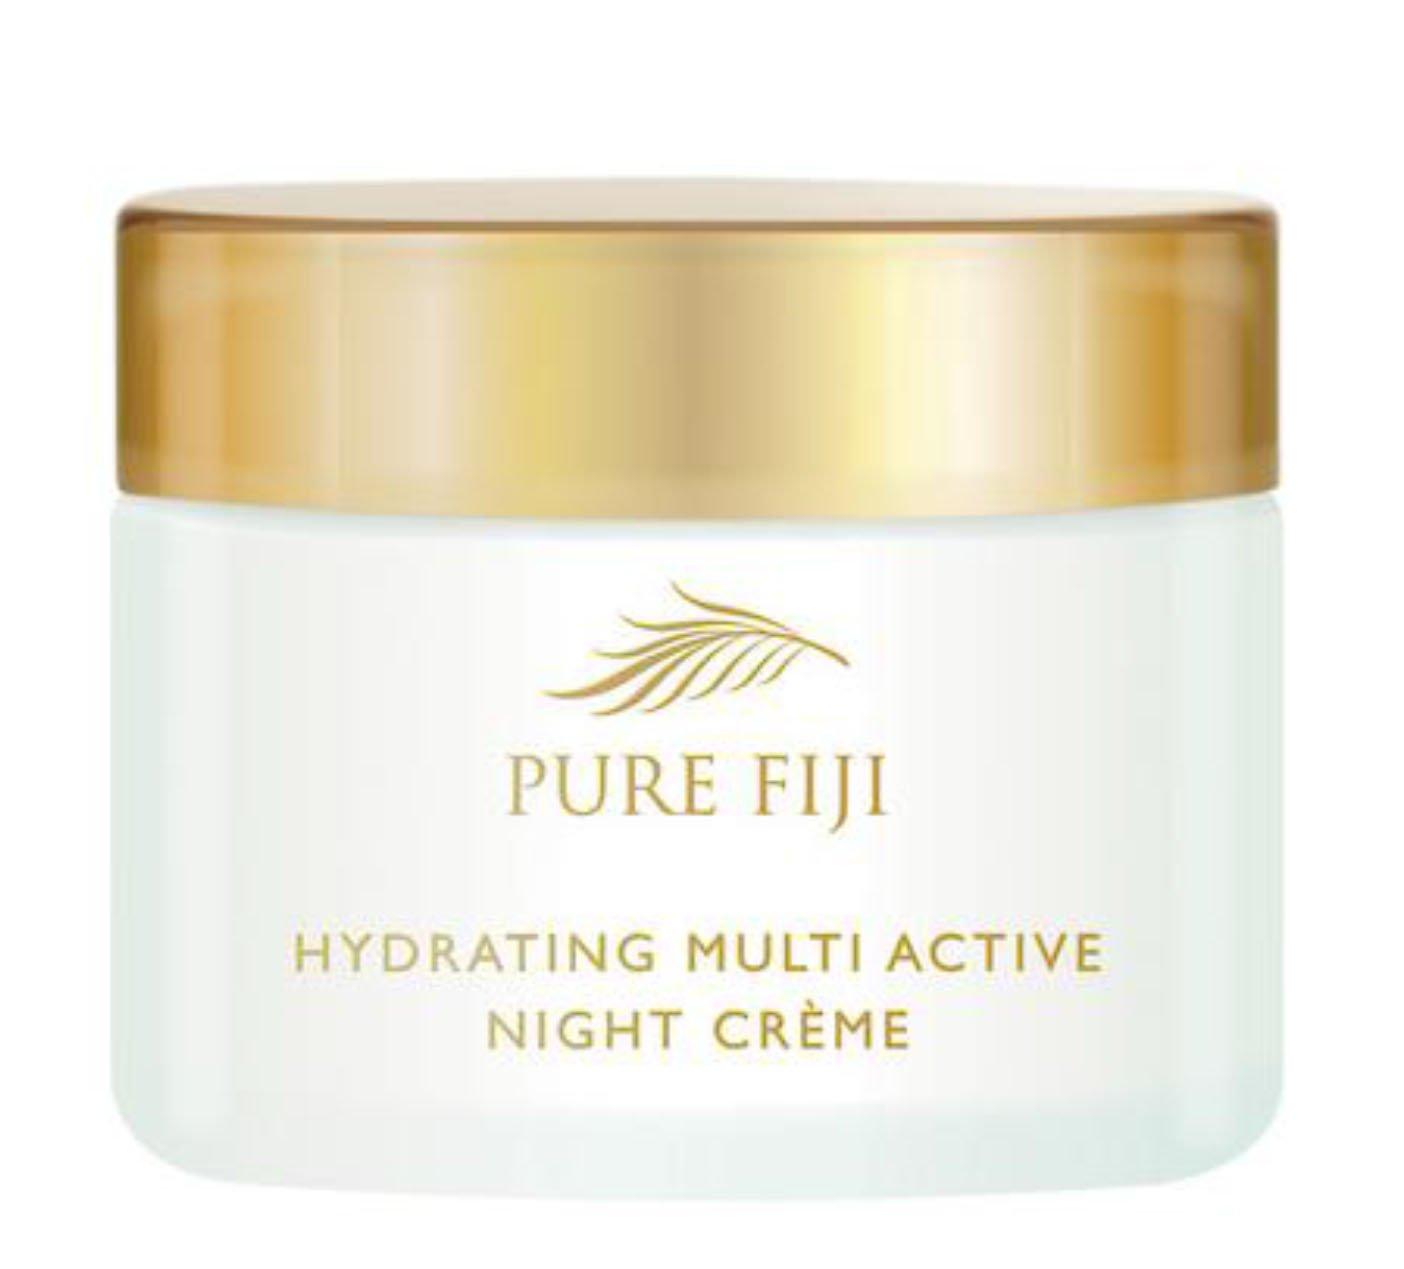 Pure Fiji Hydrating Multi-Active Night Creme 2.54oz